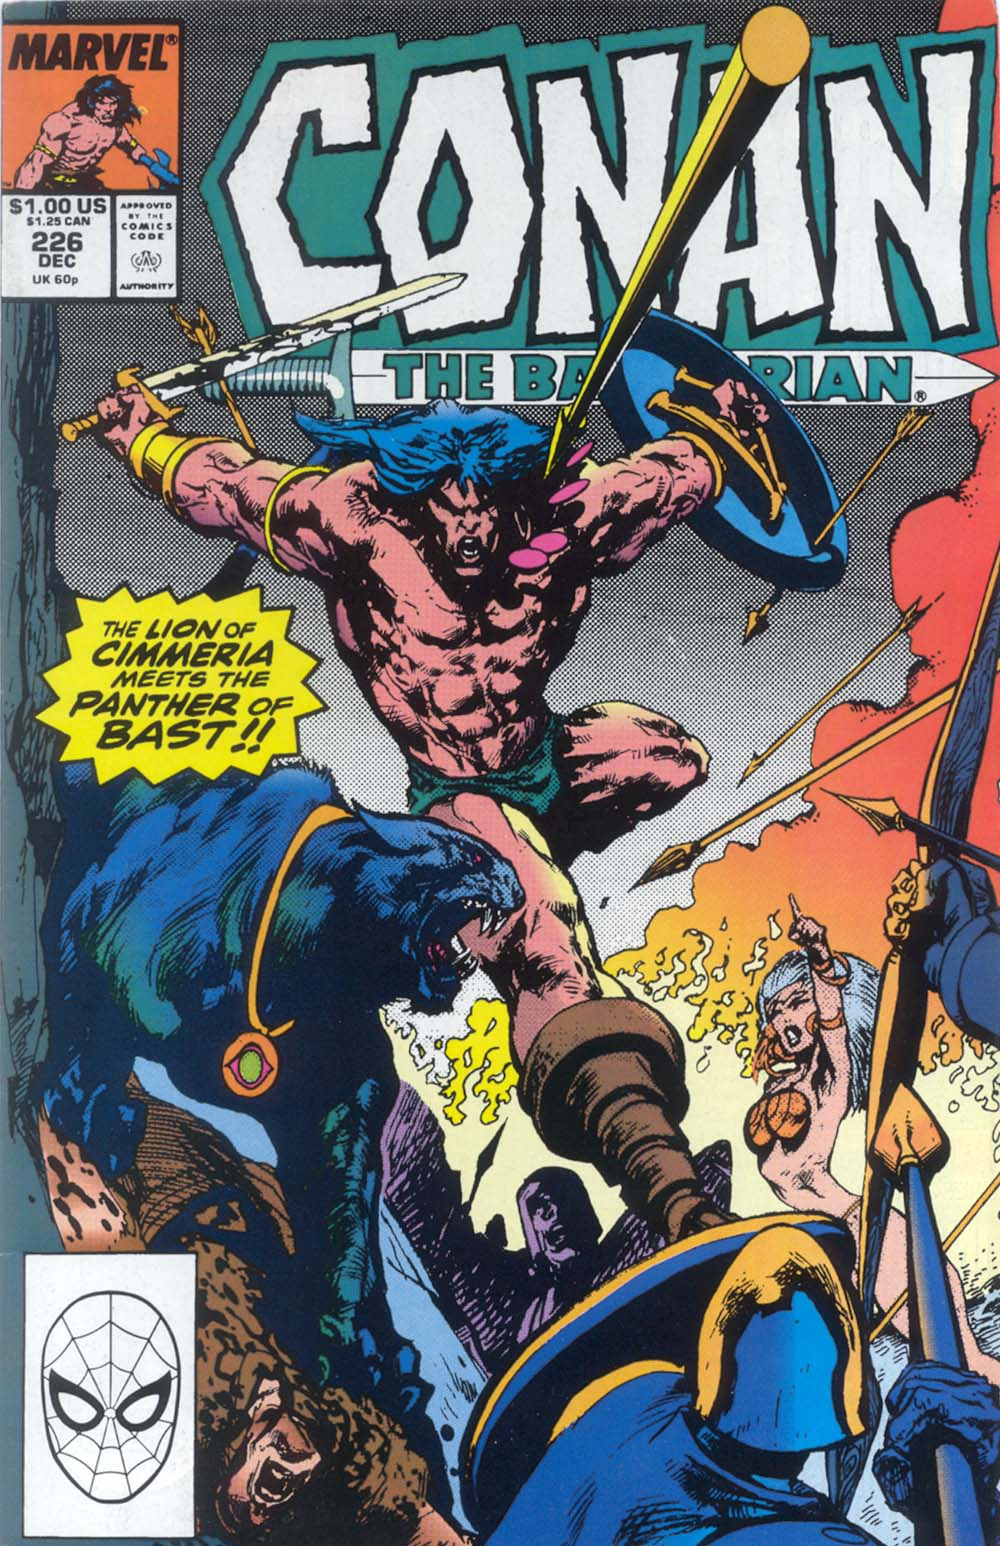 Conan the Barbarian 226